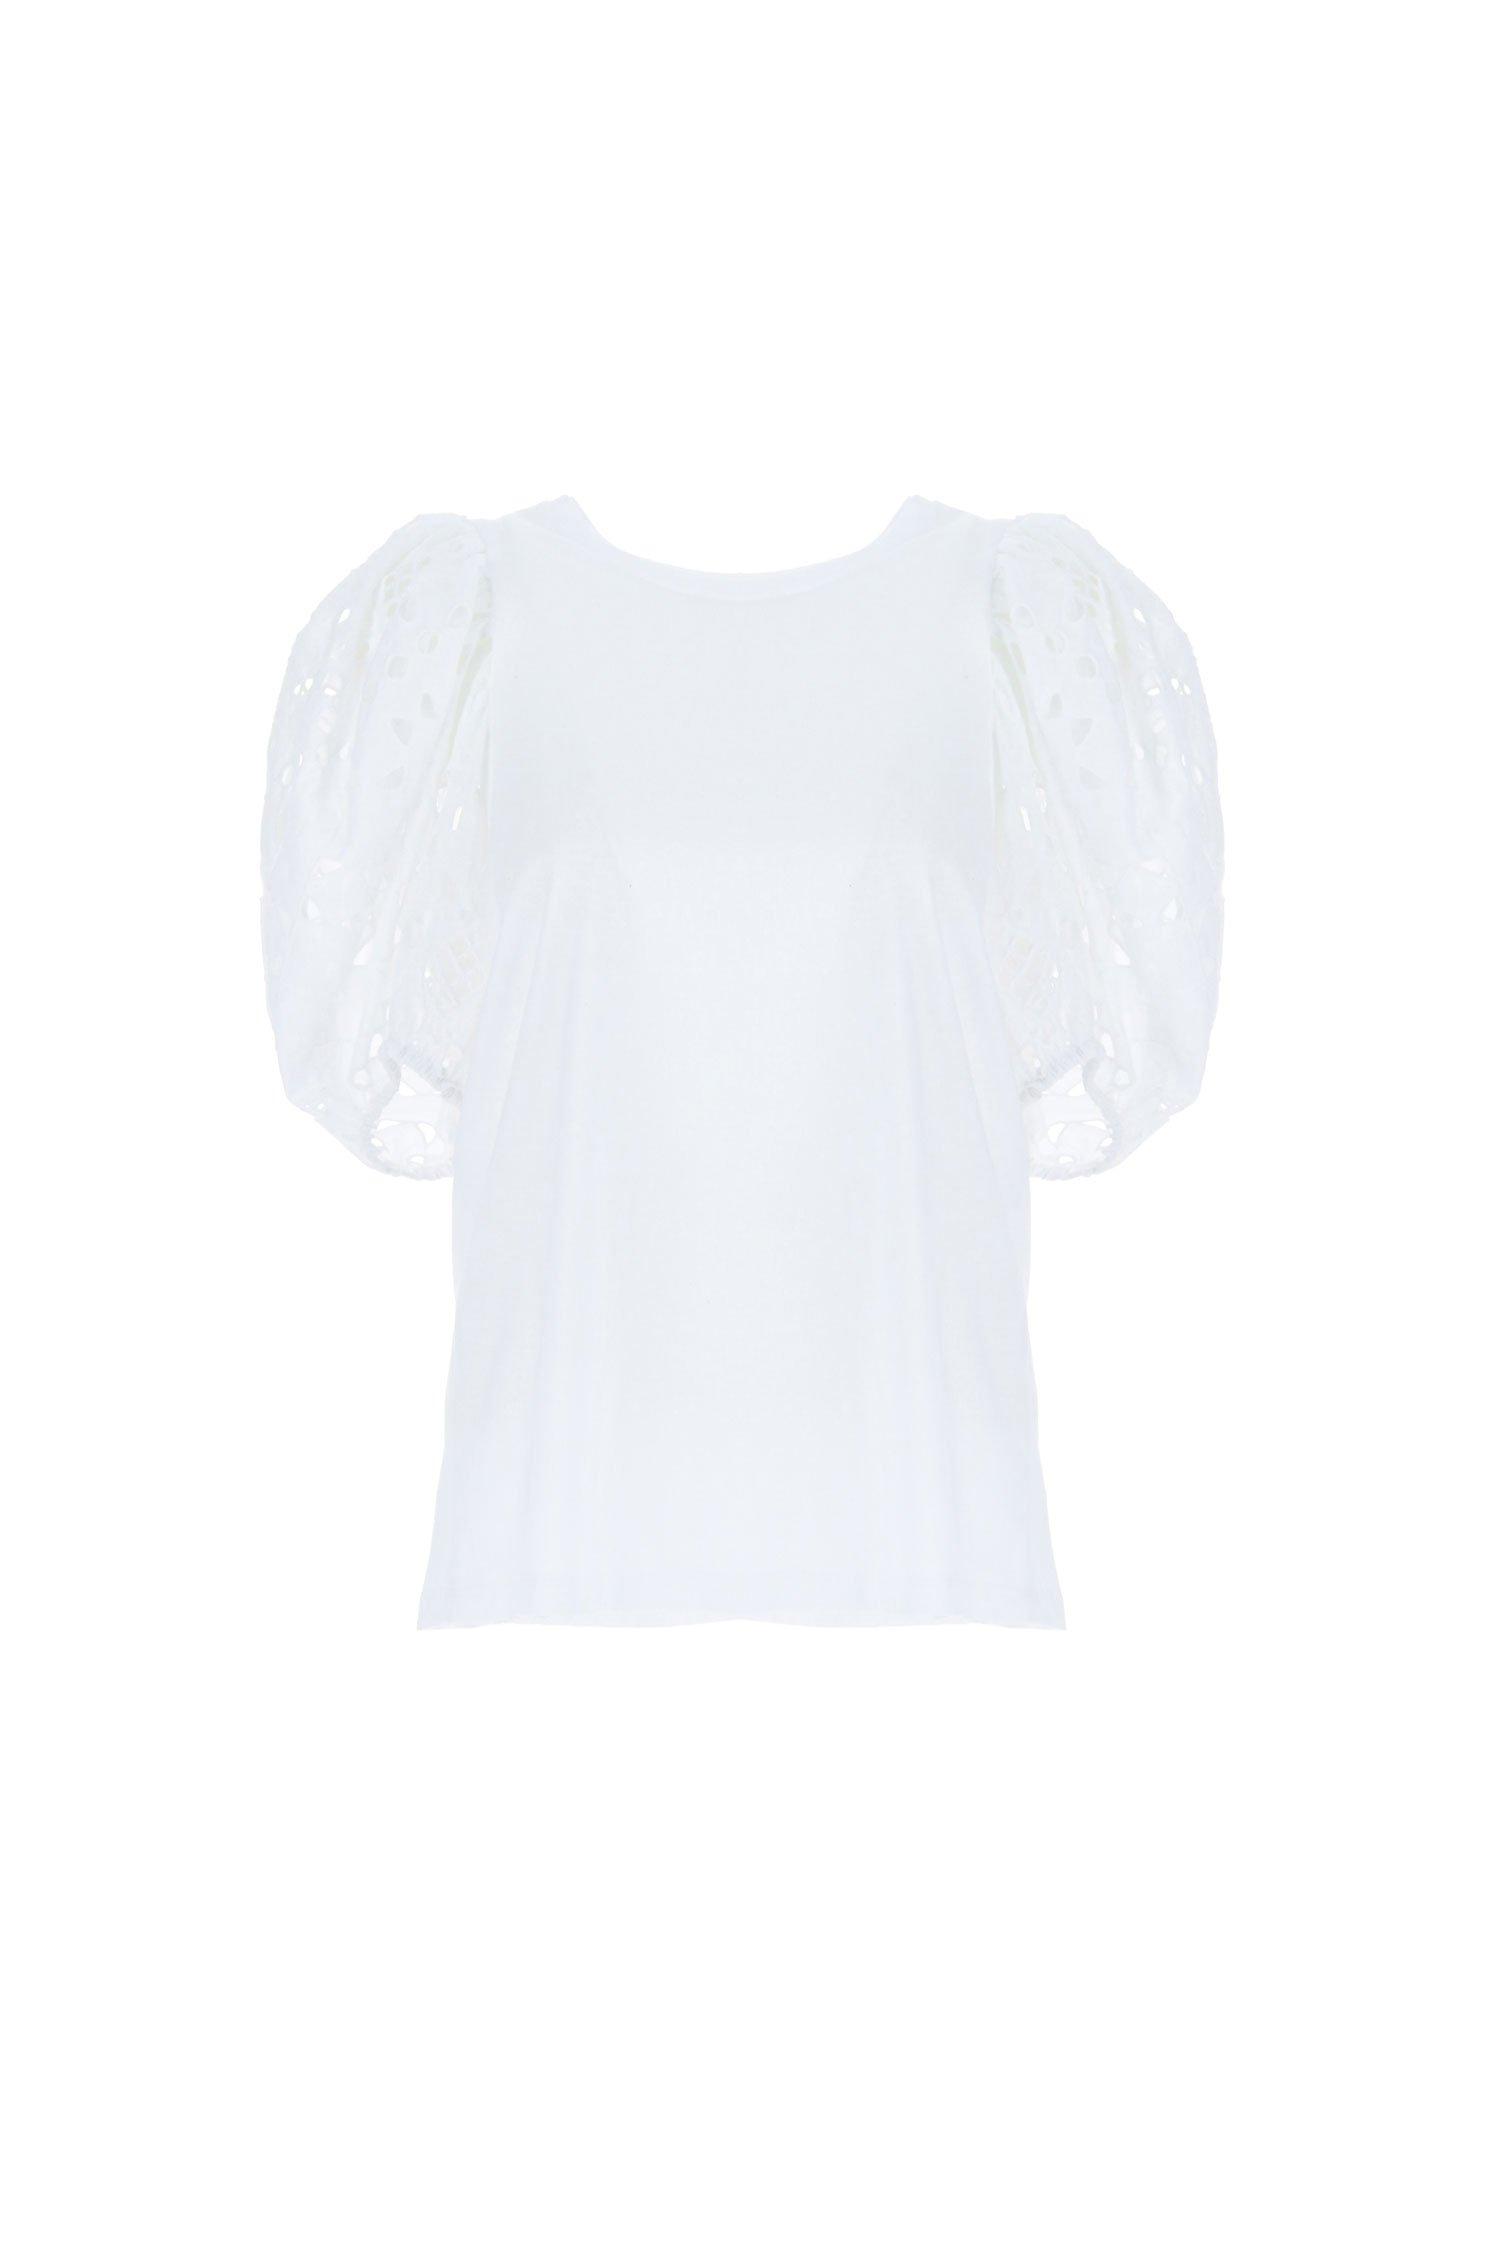 Imperial TF56ZCUZ35 T-Shirt - White